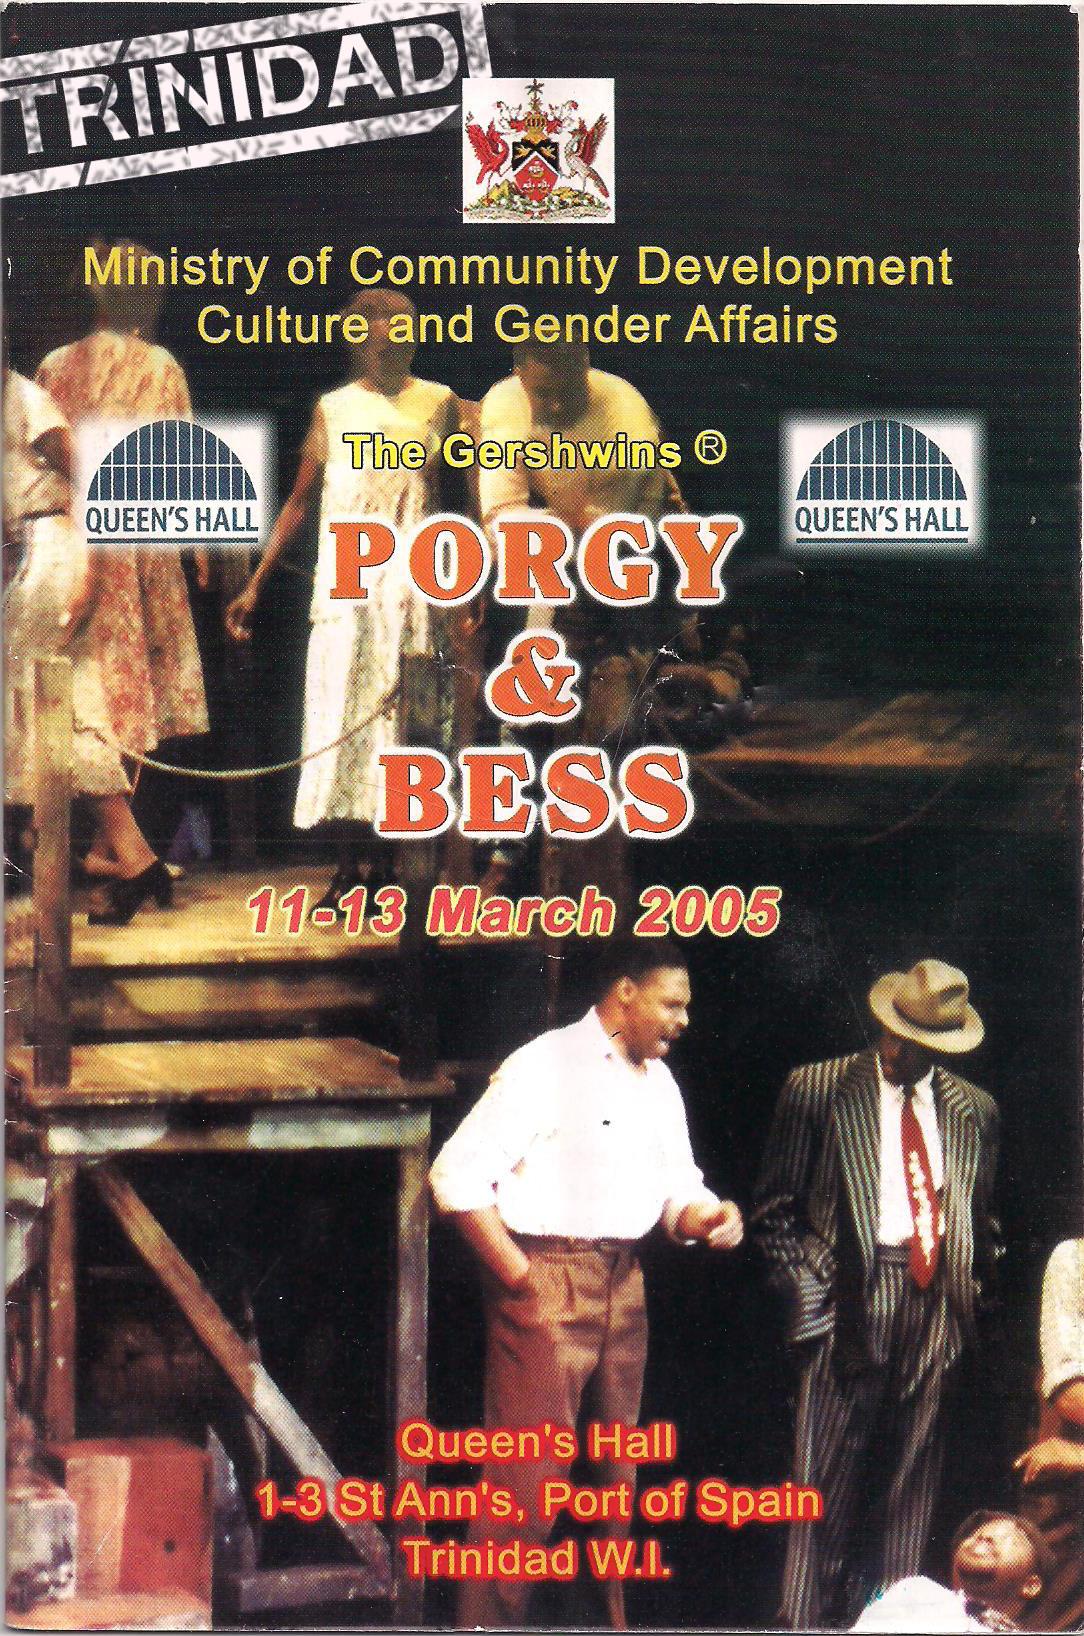 Porgy and Bess TRINIDAD Ver 2.JPG